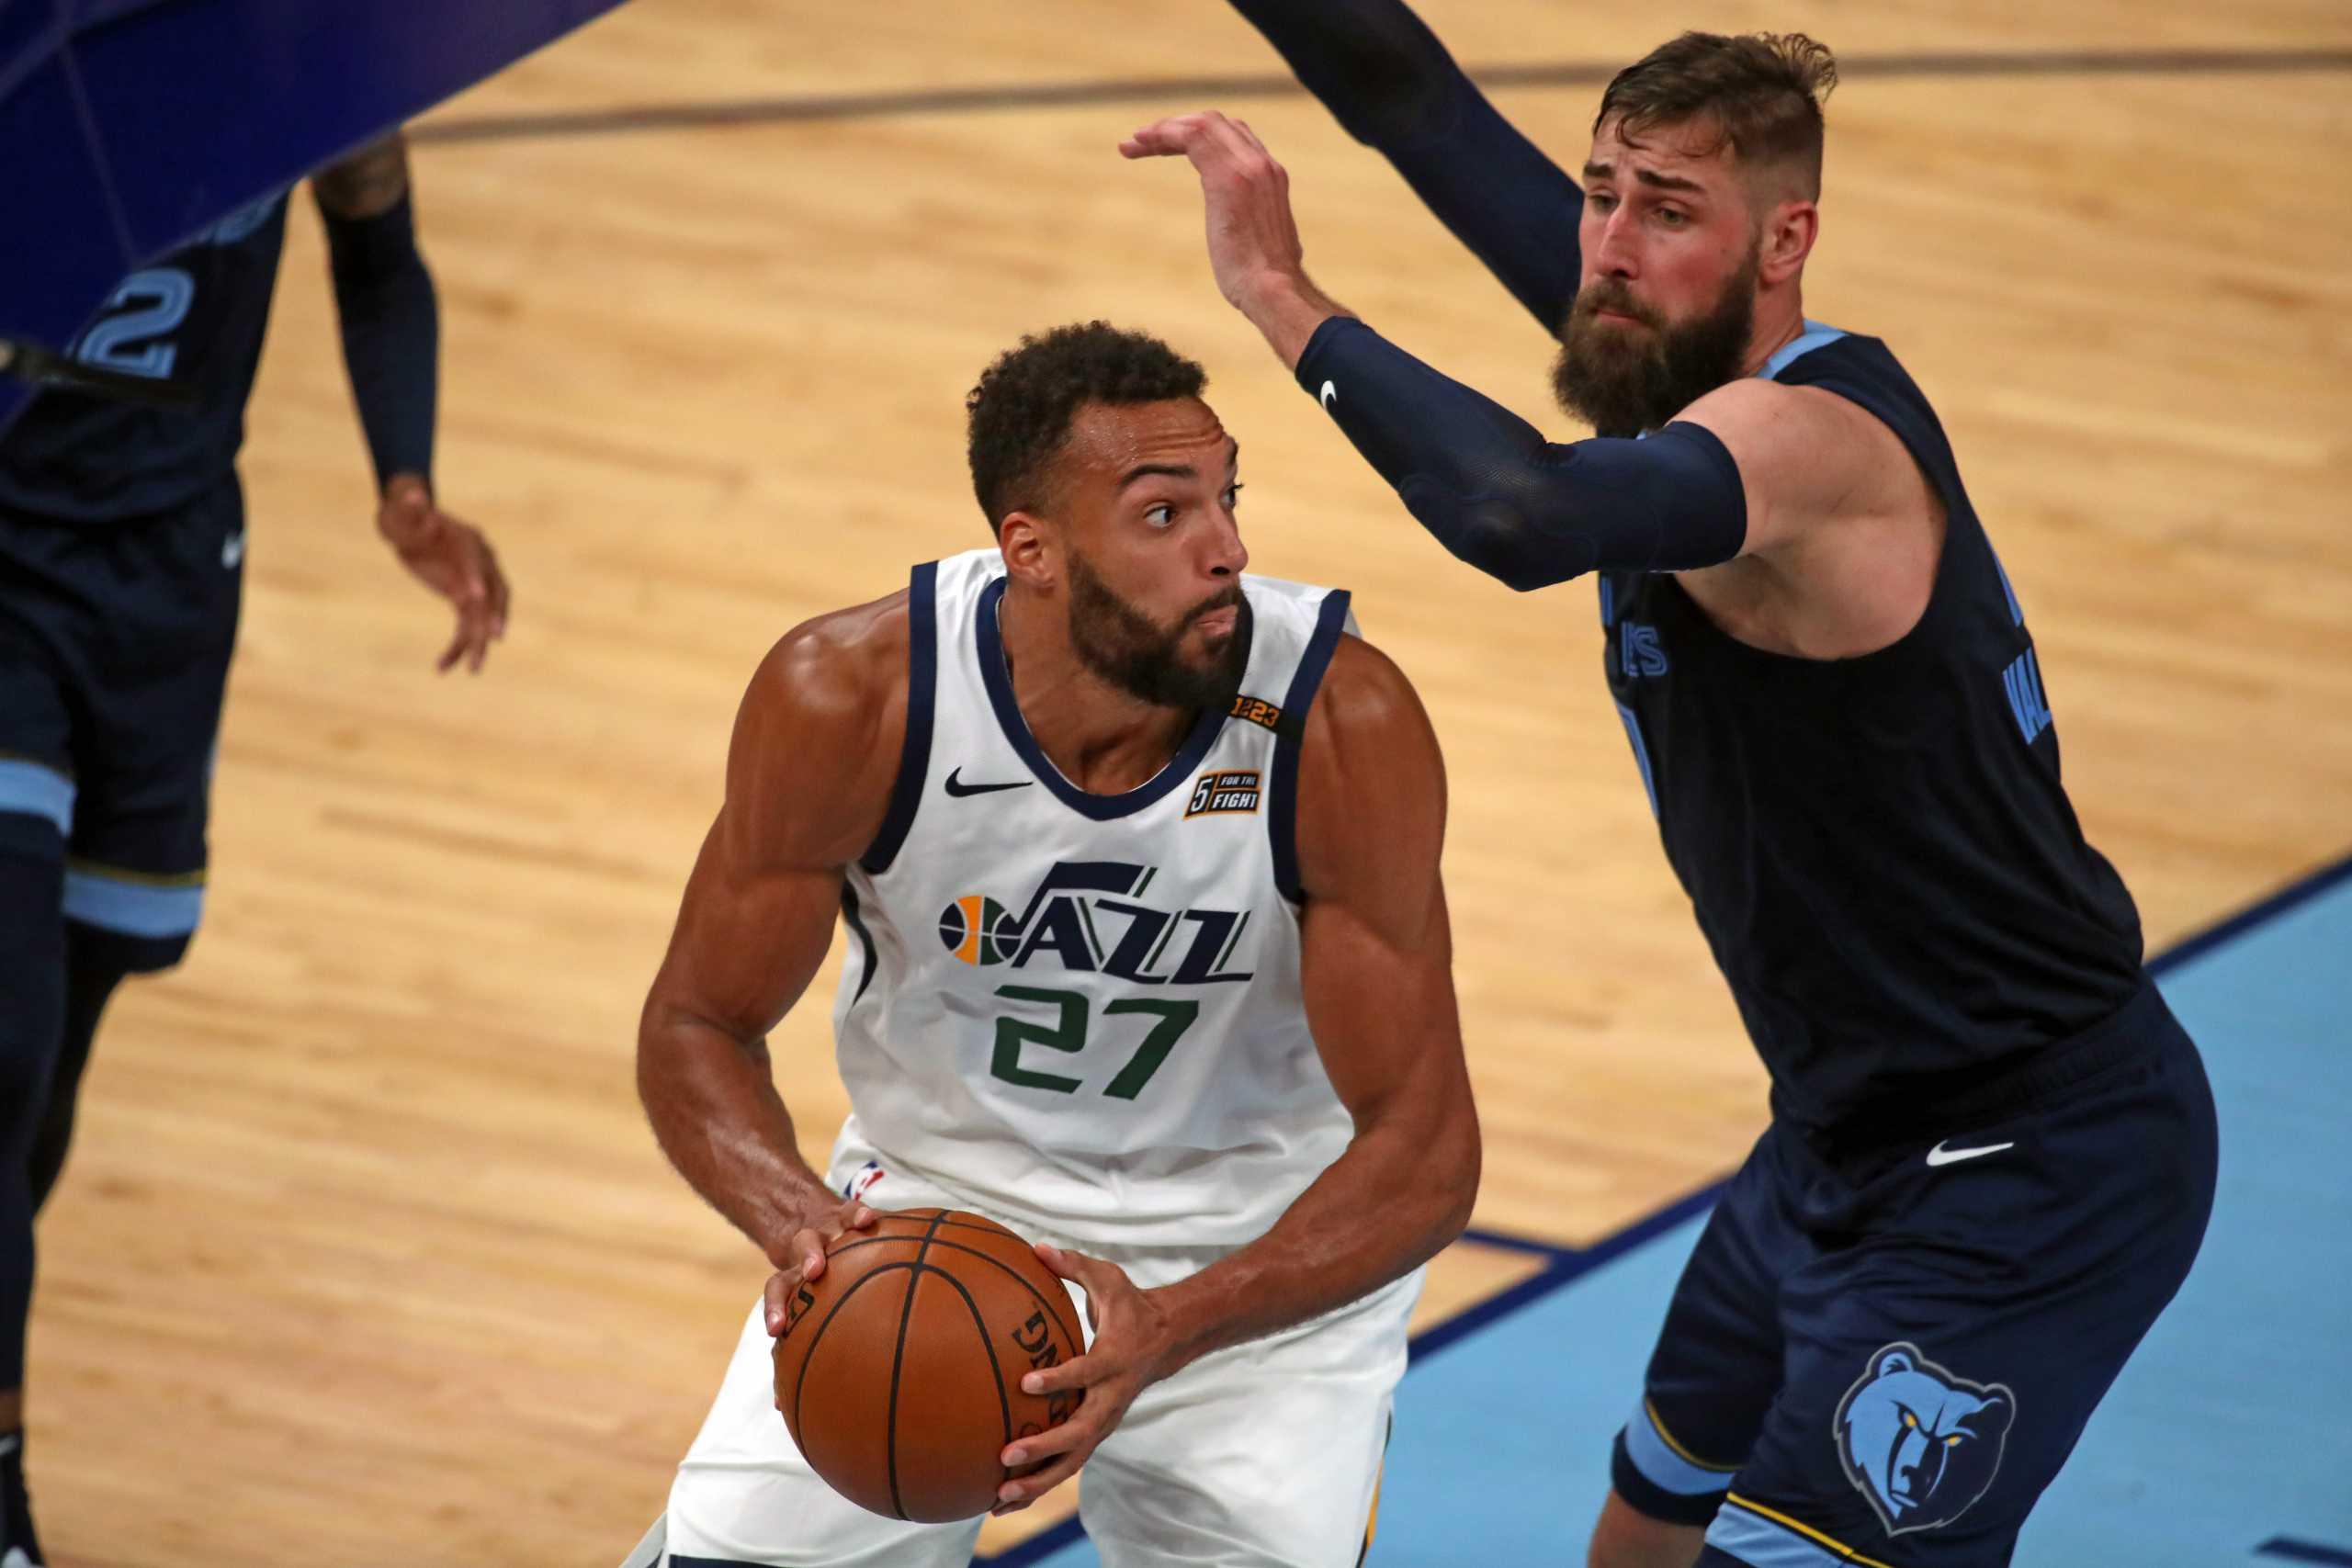 NBA: Σπουδαίο διπλό για Τζαζ, πρώτη νίκη για Ουίζαρντς